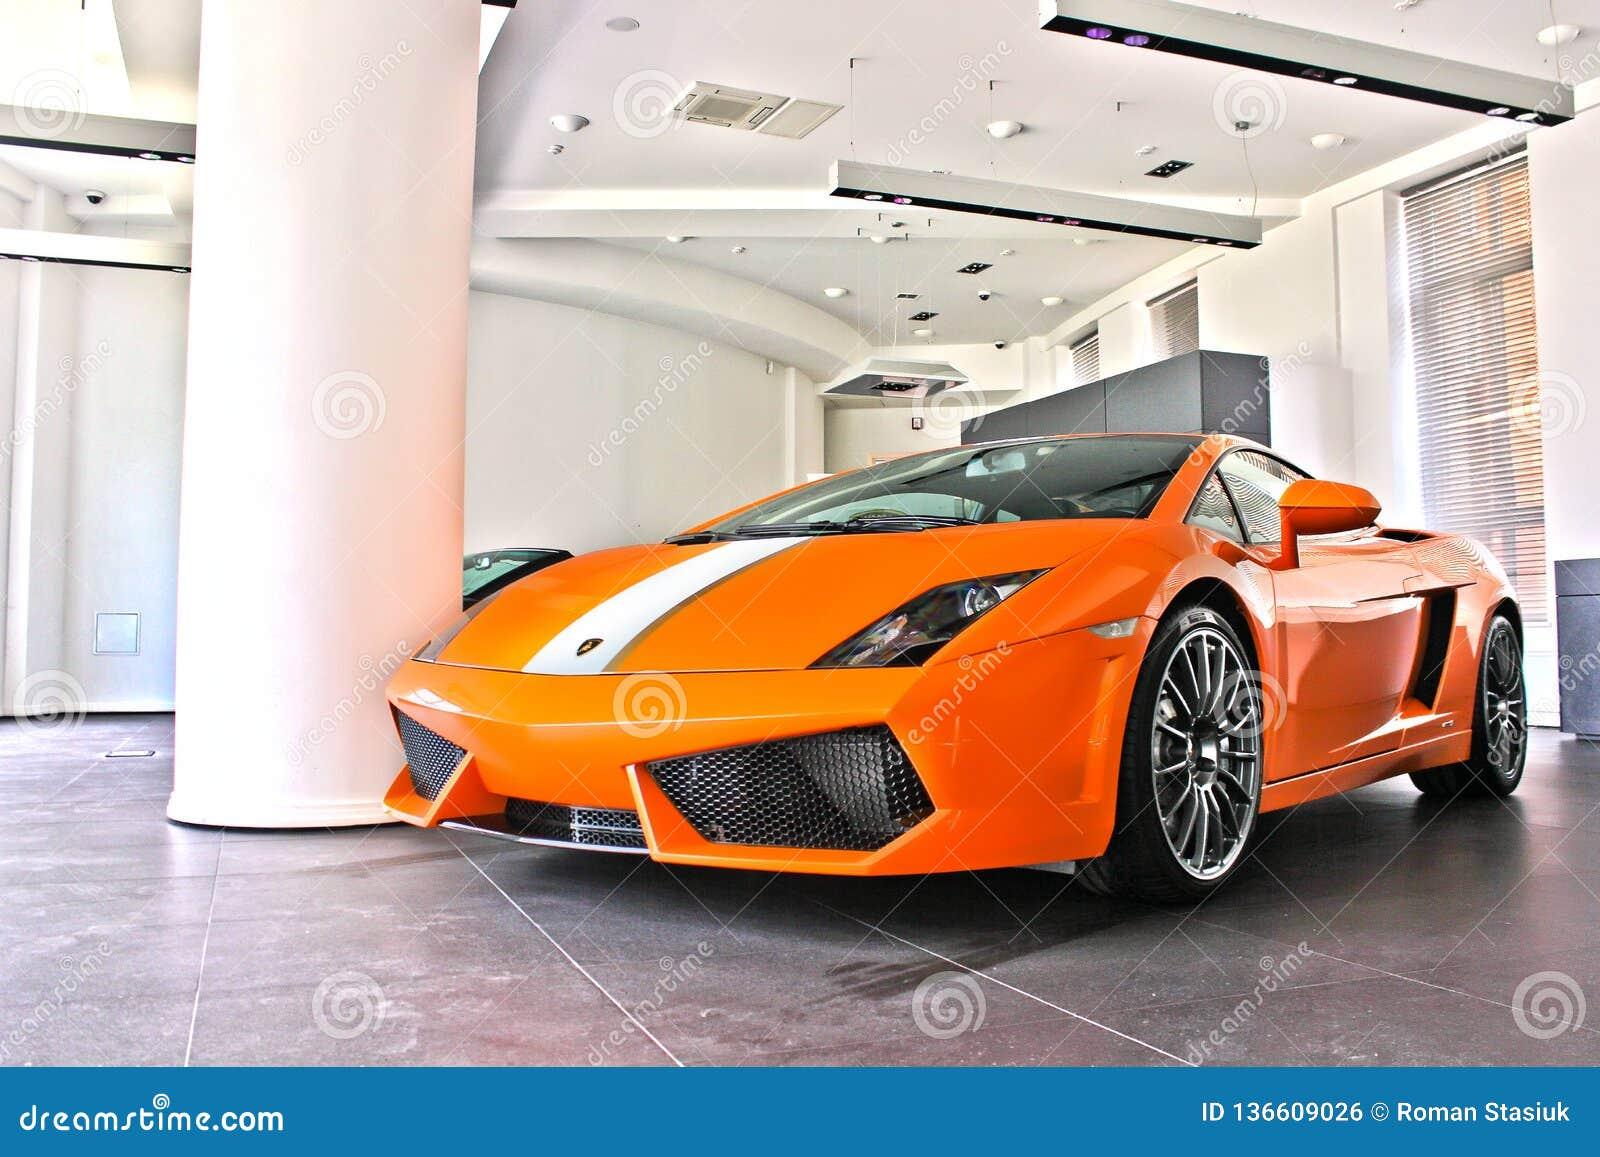 17 febbraio 2011 l Ucraina, Kiev Lamborghini Gallardo LP550-2 Valentino Balboni